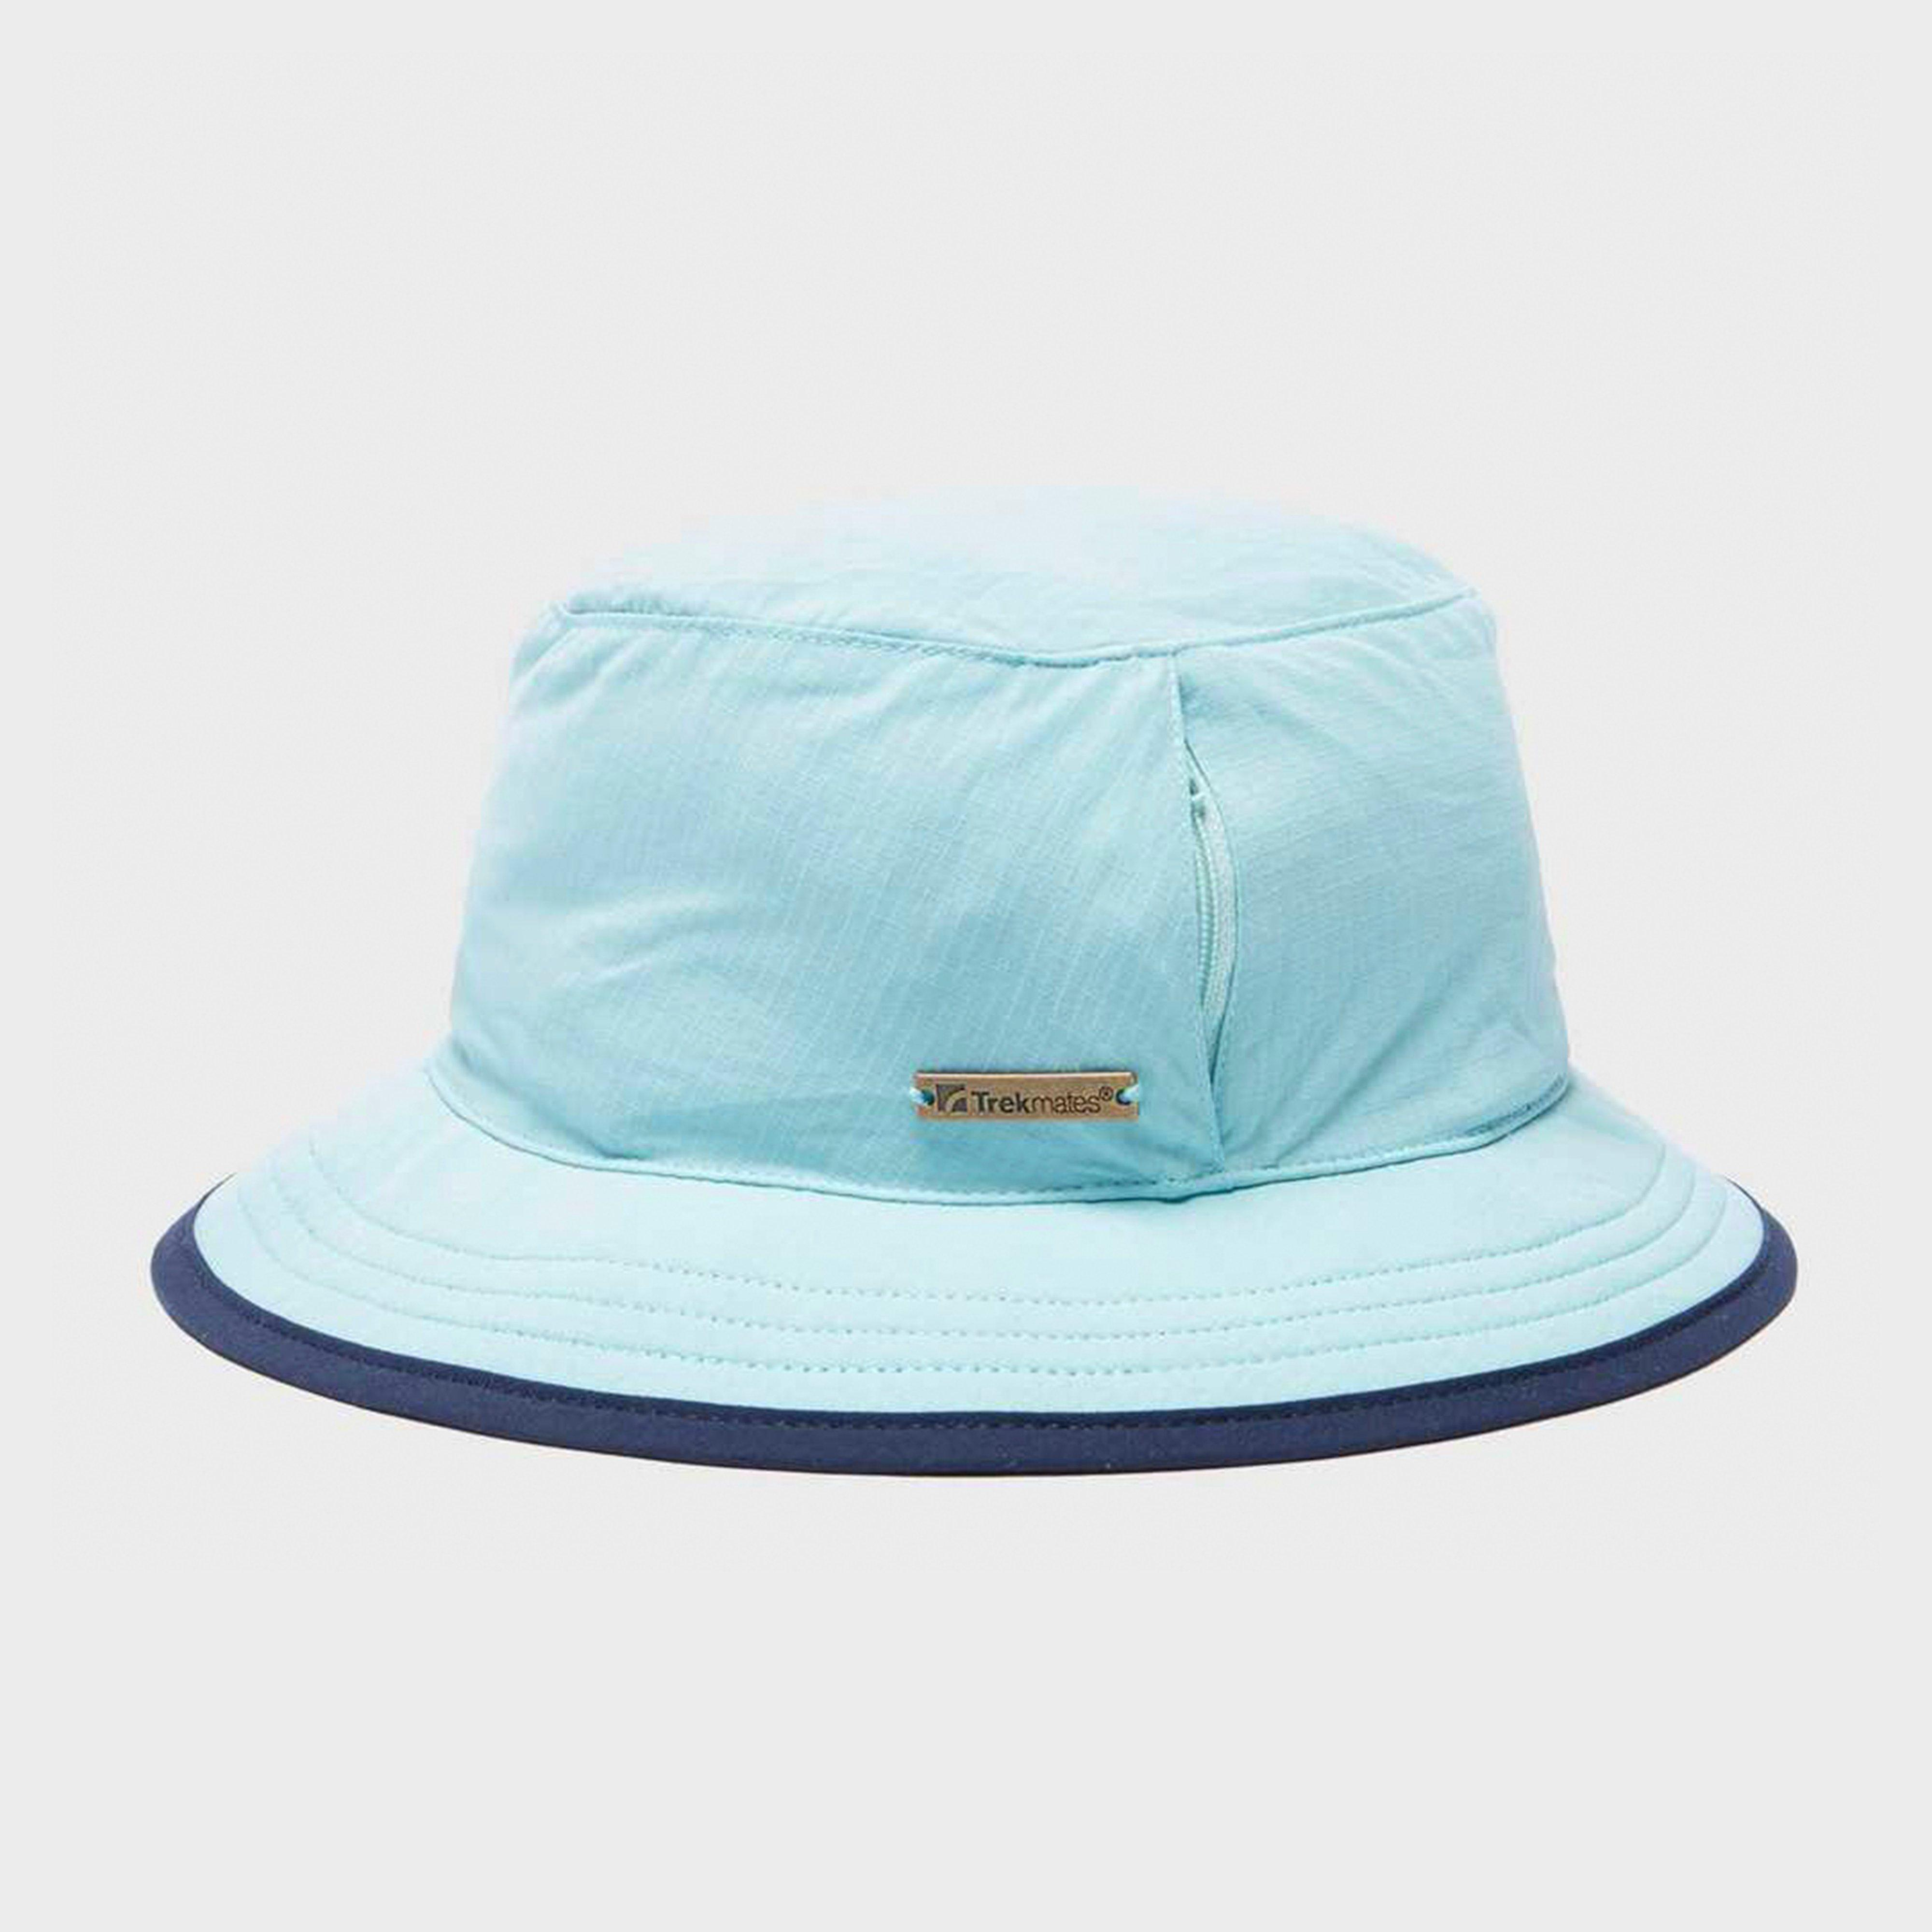 Trekmates Women's Ordos Hat, Blue